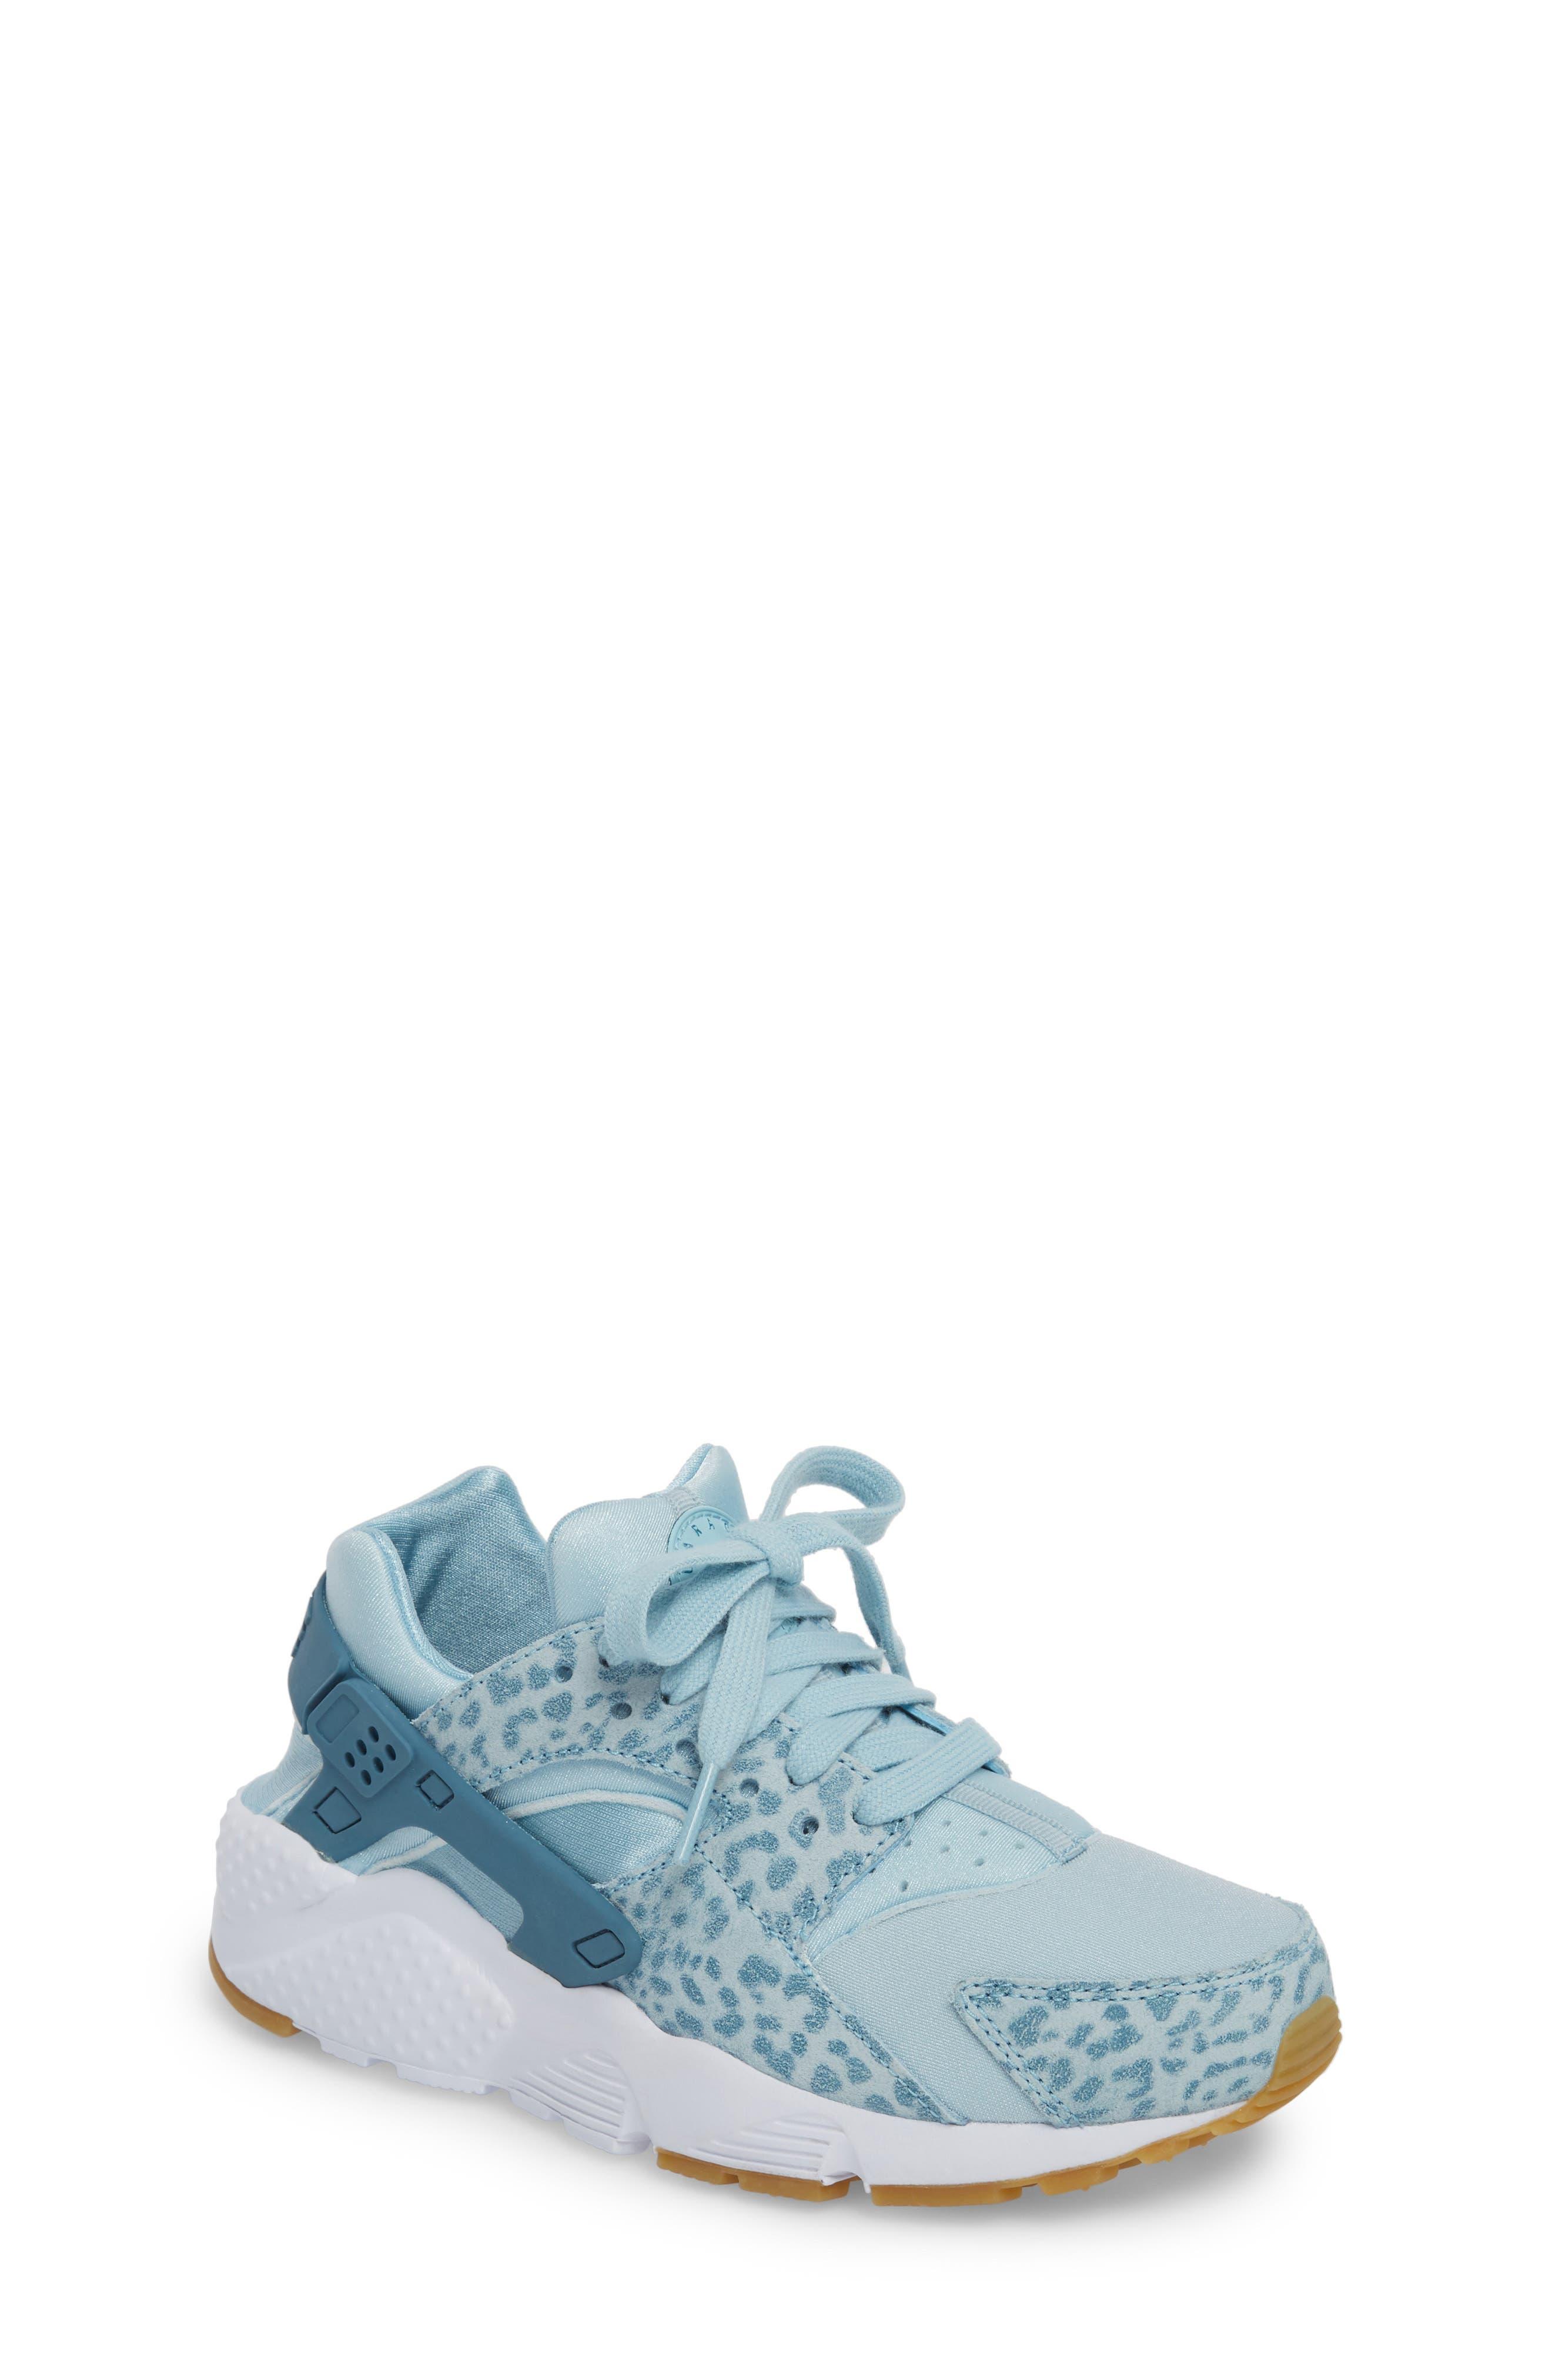 Alternate Image 1 Selected - Nike Huarache Run SE Sneaker (Baby, Walker, Toddler, Little Kid & Big Kid)